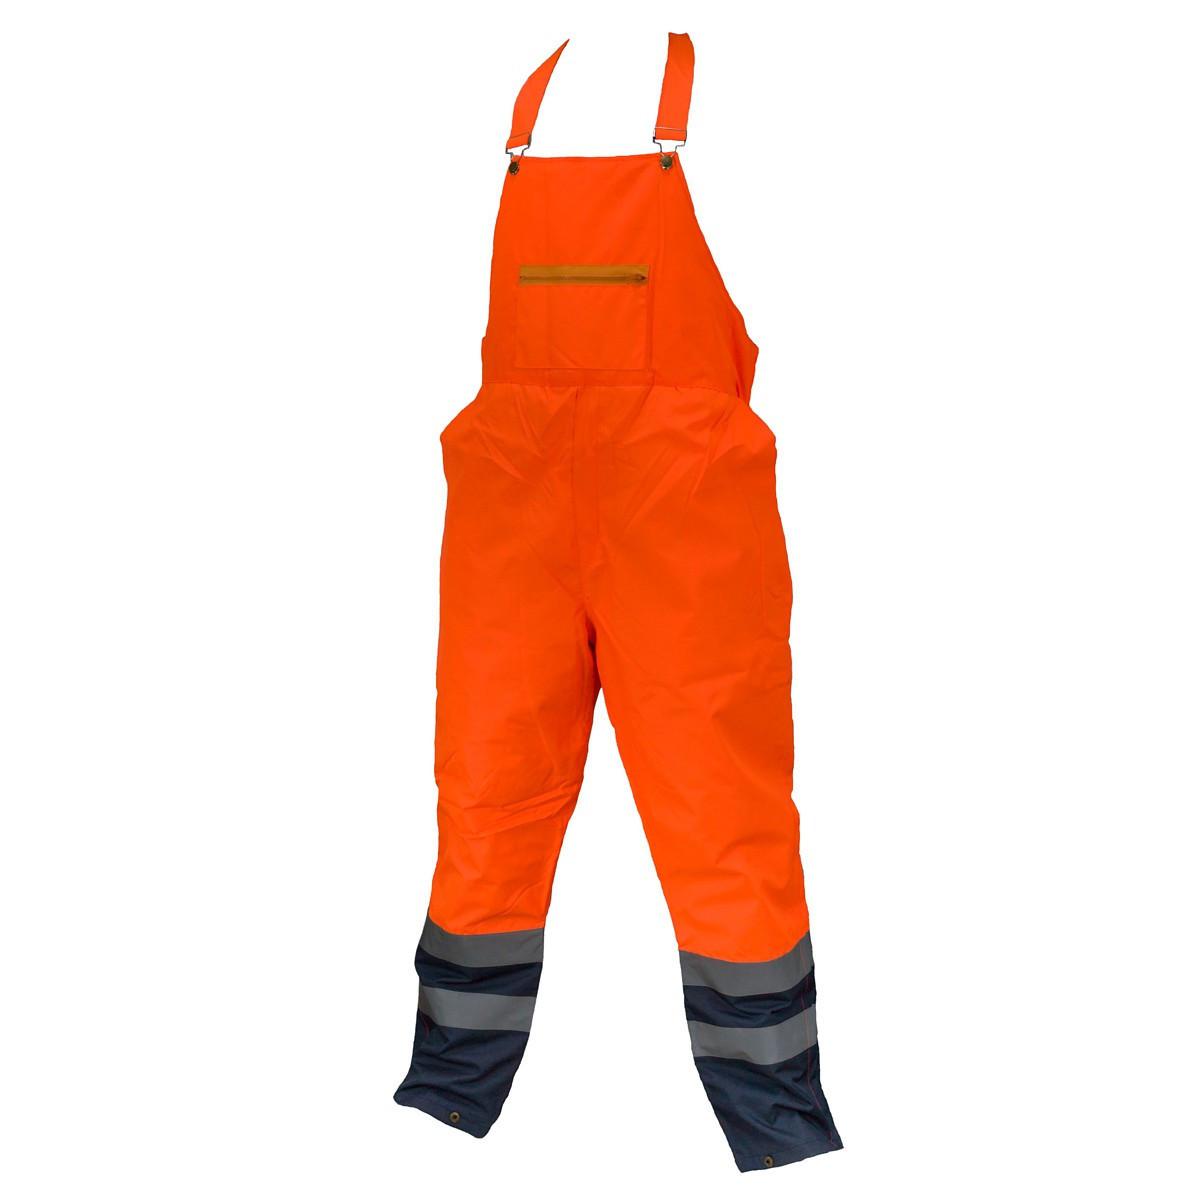 Предупреждающие брюки SPODNIE OGRODNICZKI HSV ORANGE водооталкивающие, оранжевого цвета.  Urgent (POLAND)